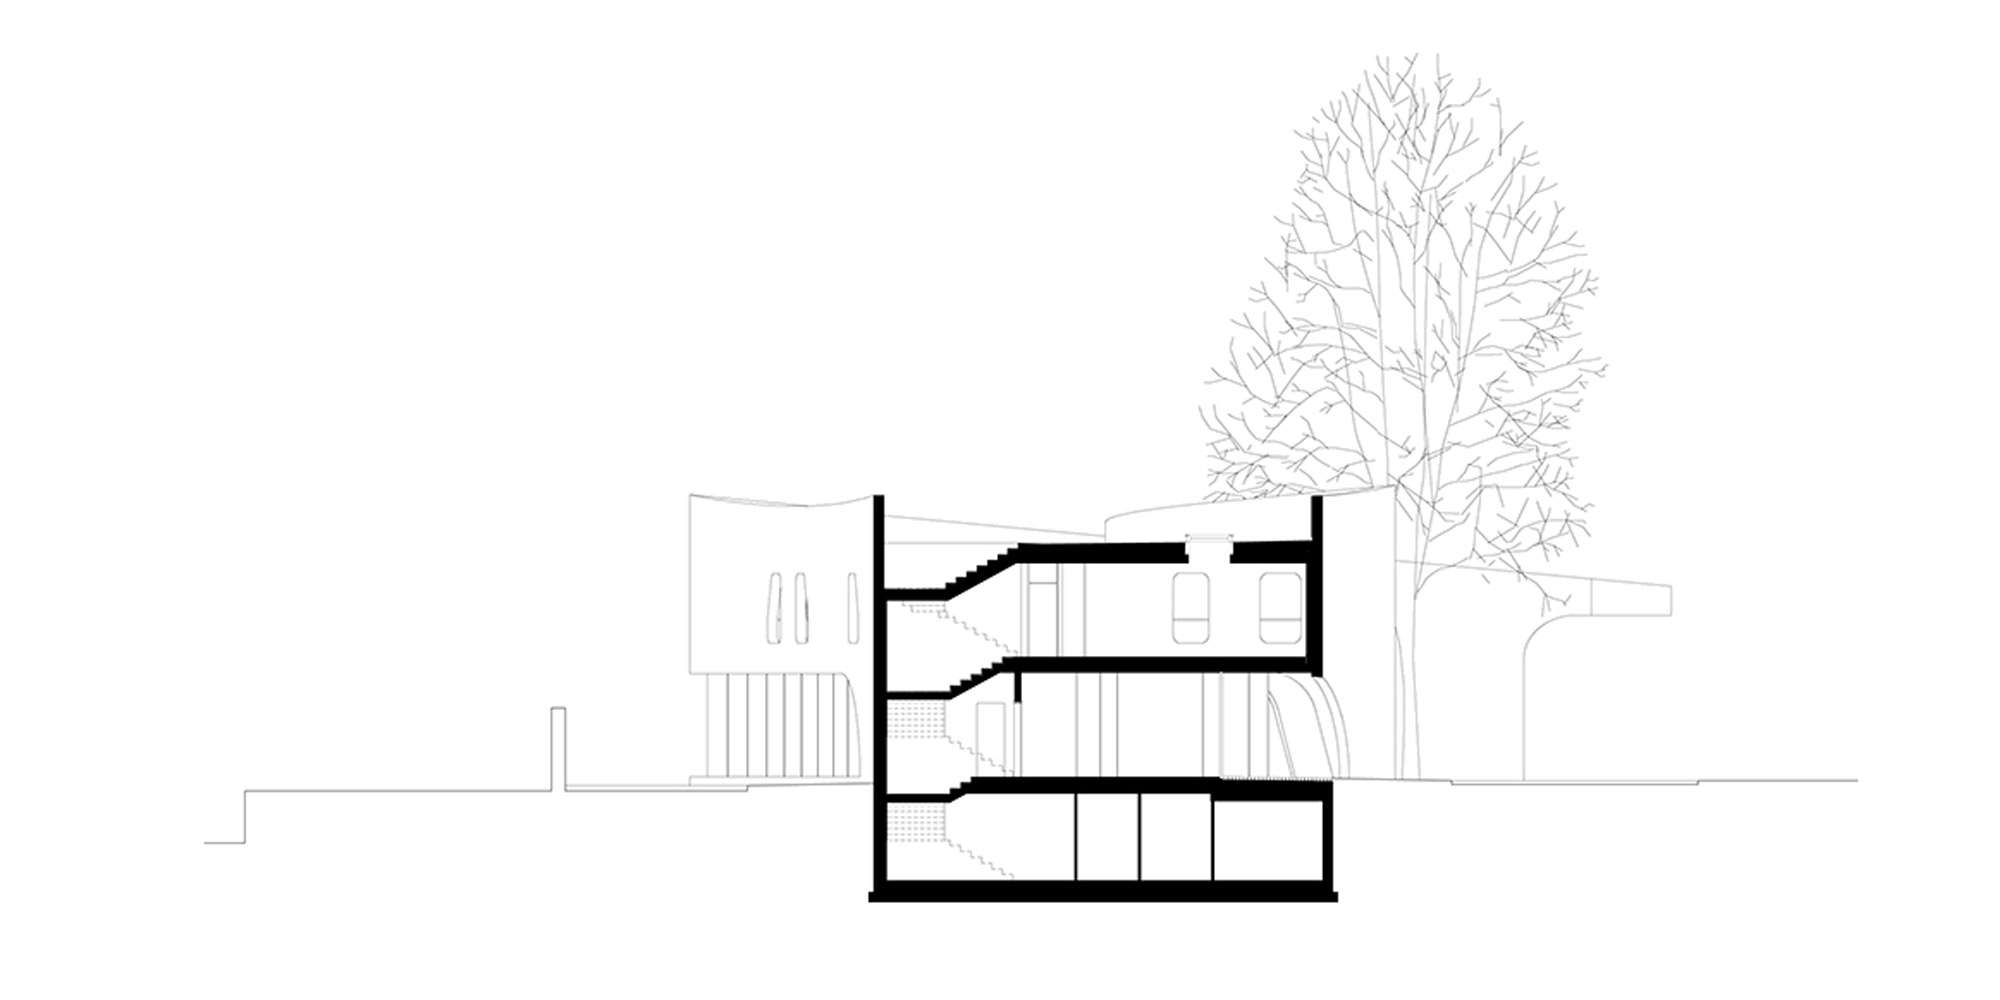 Sezione trasversale © MoDus Architects